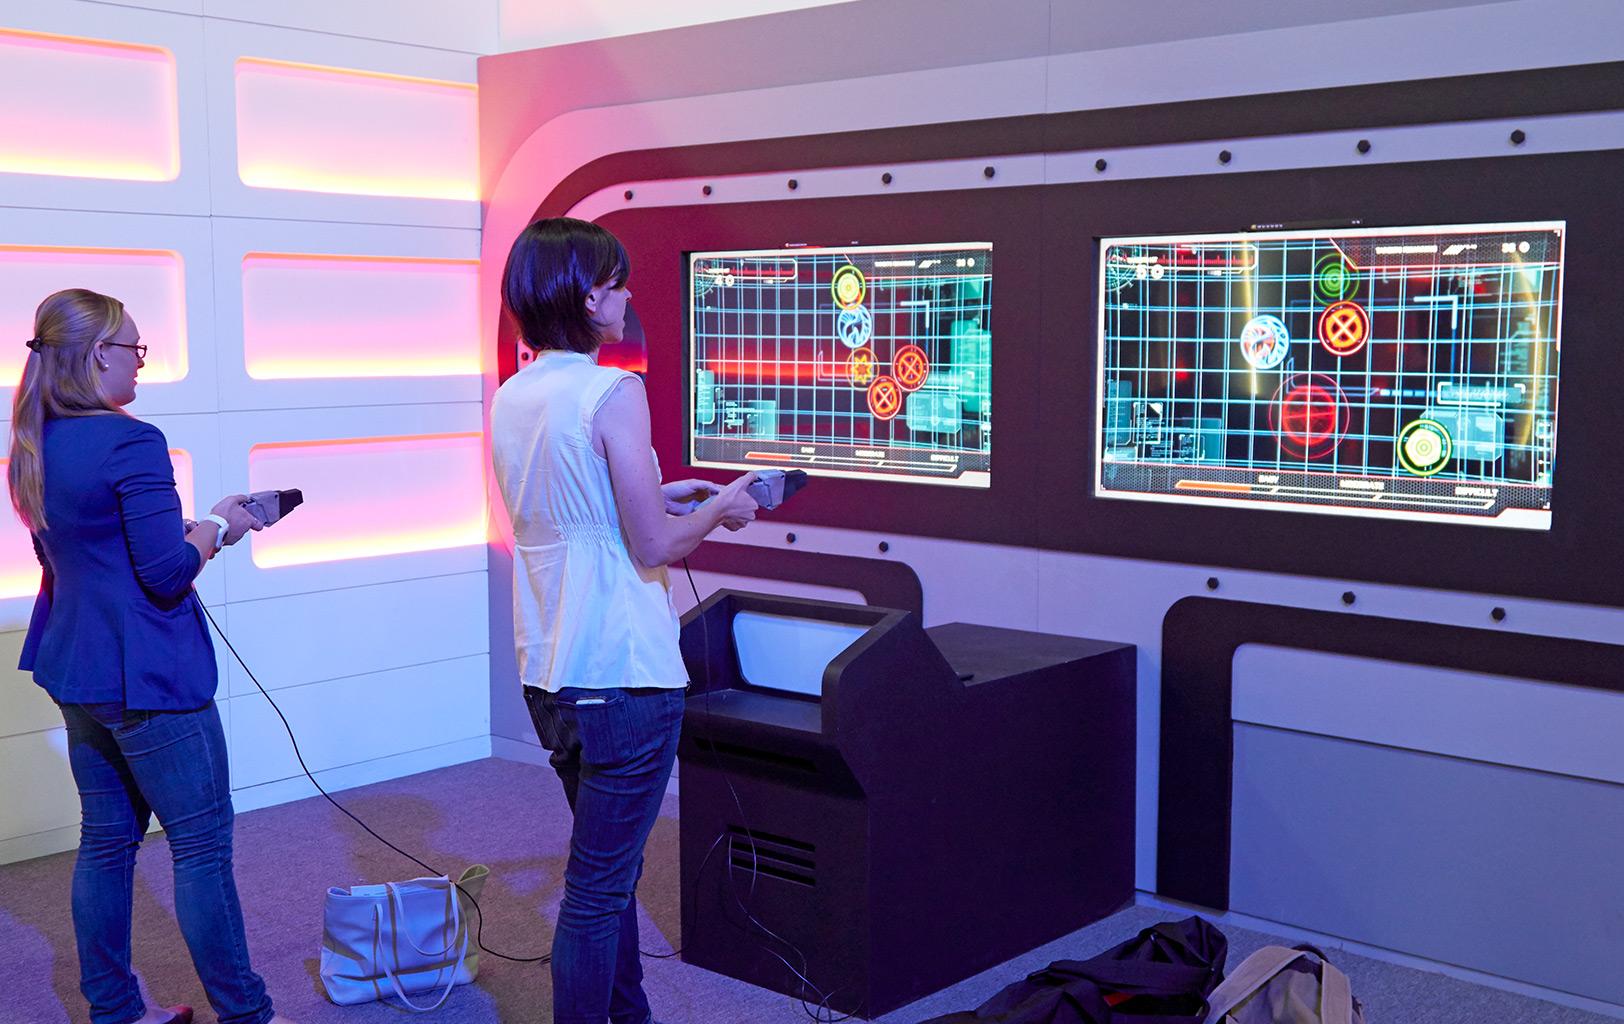 The Starfleet Academy Experience: Inside the Intrepid ꞌStar Trekꞌ Exhibit (Photos)